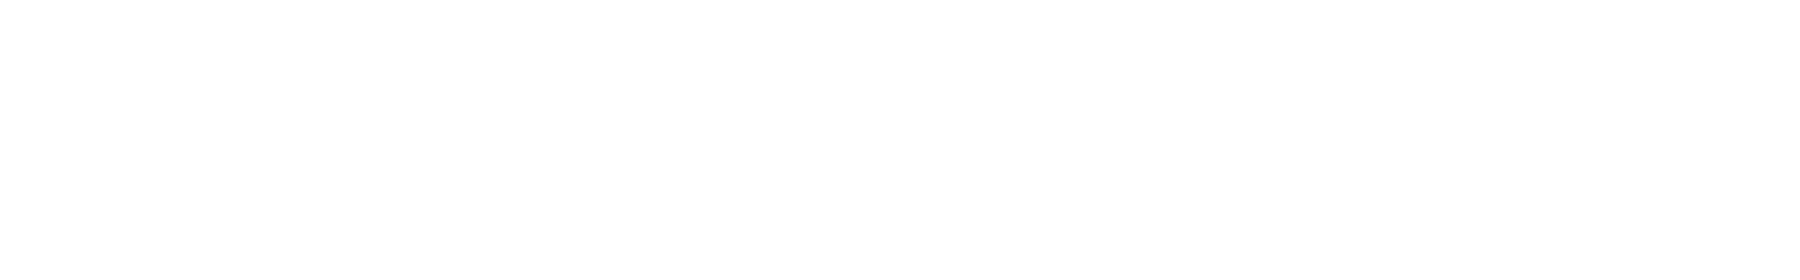 vedh melodyloop 046 bm g em 124bpm